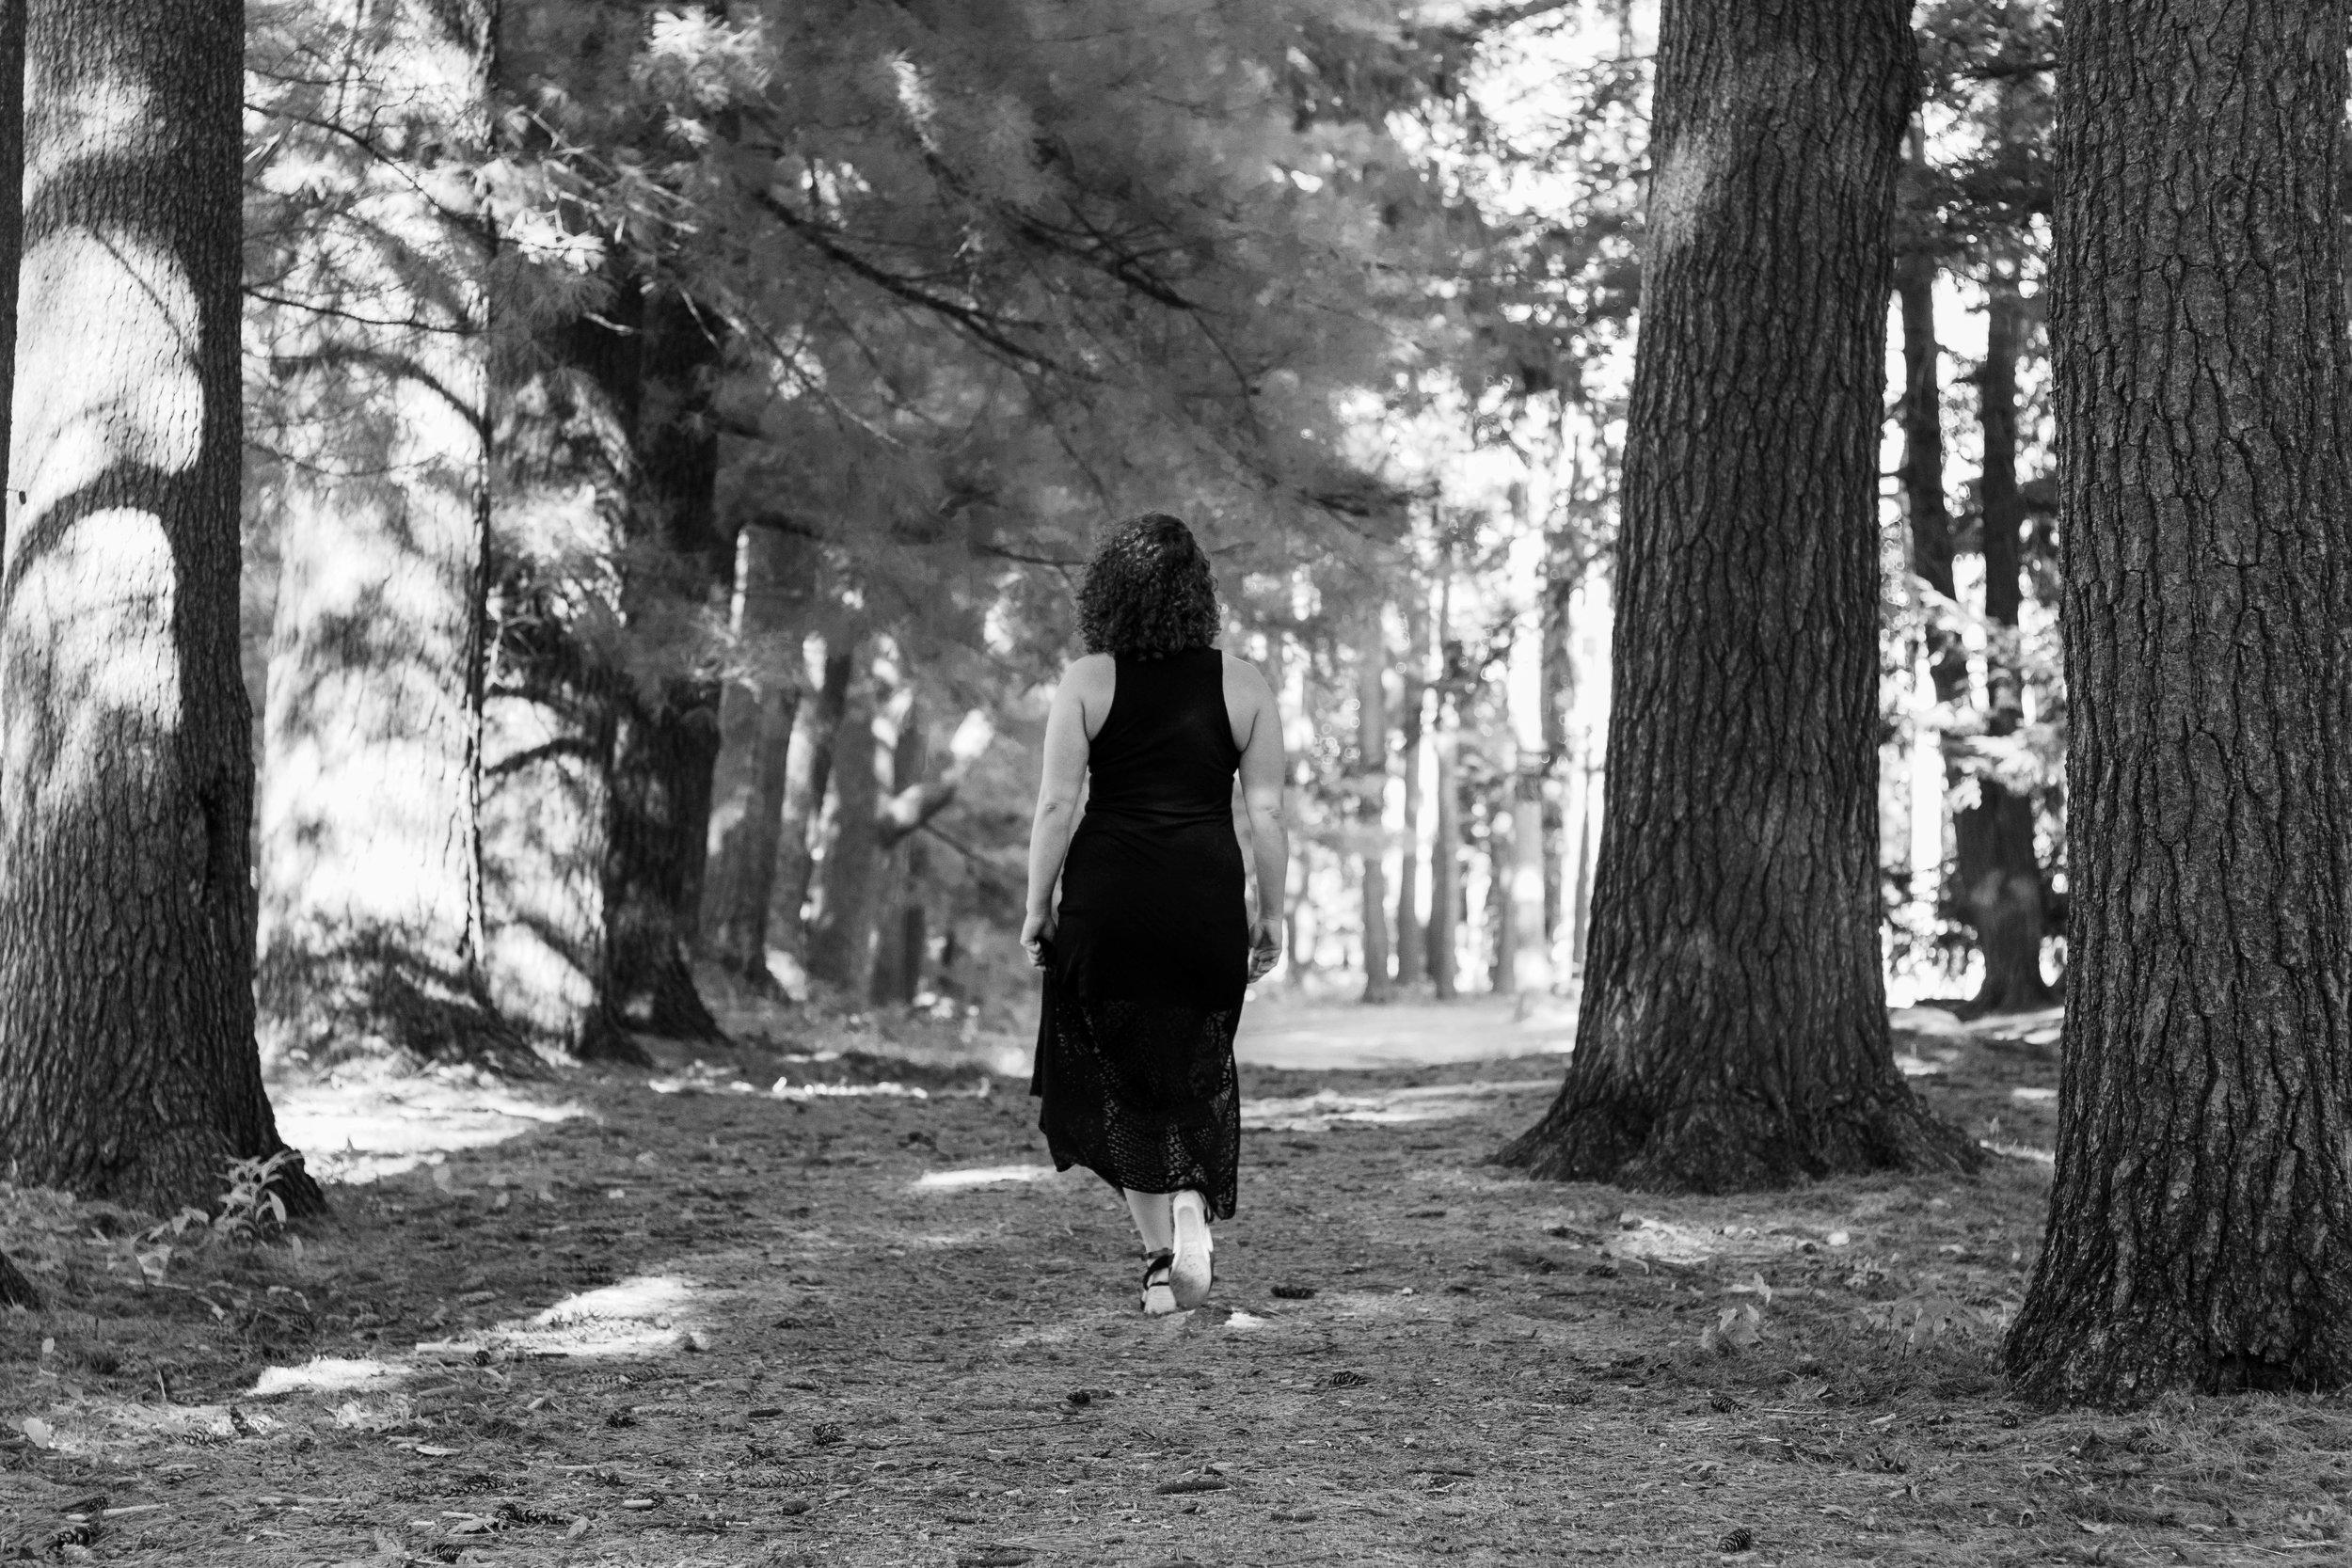 black and white headshot photo